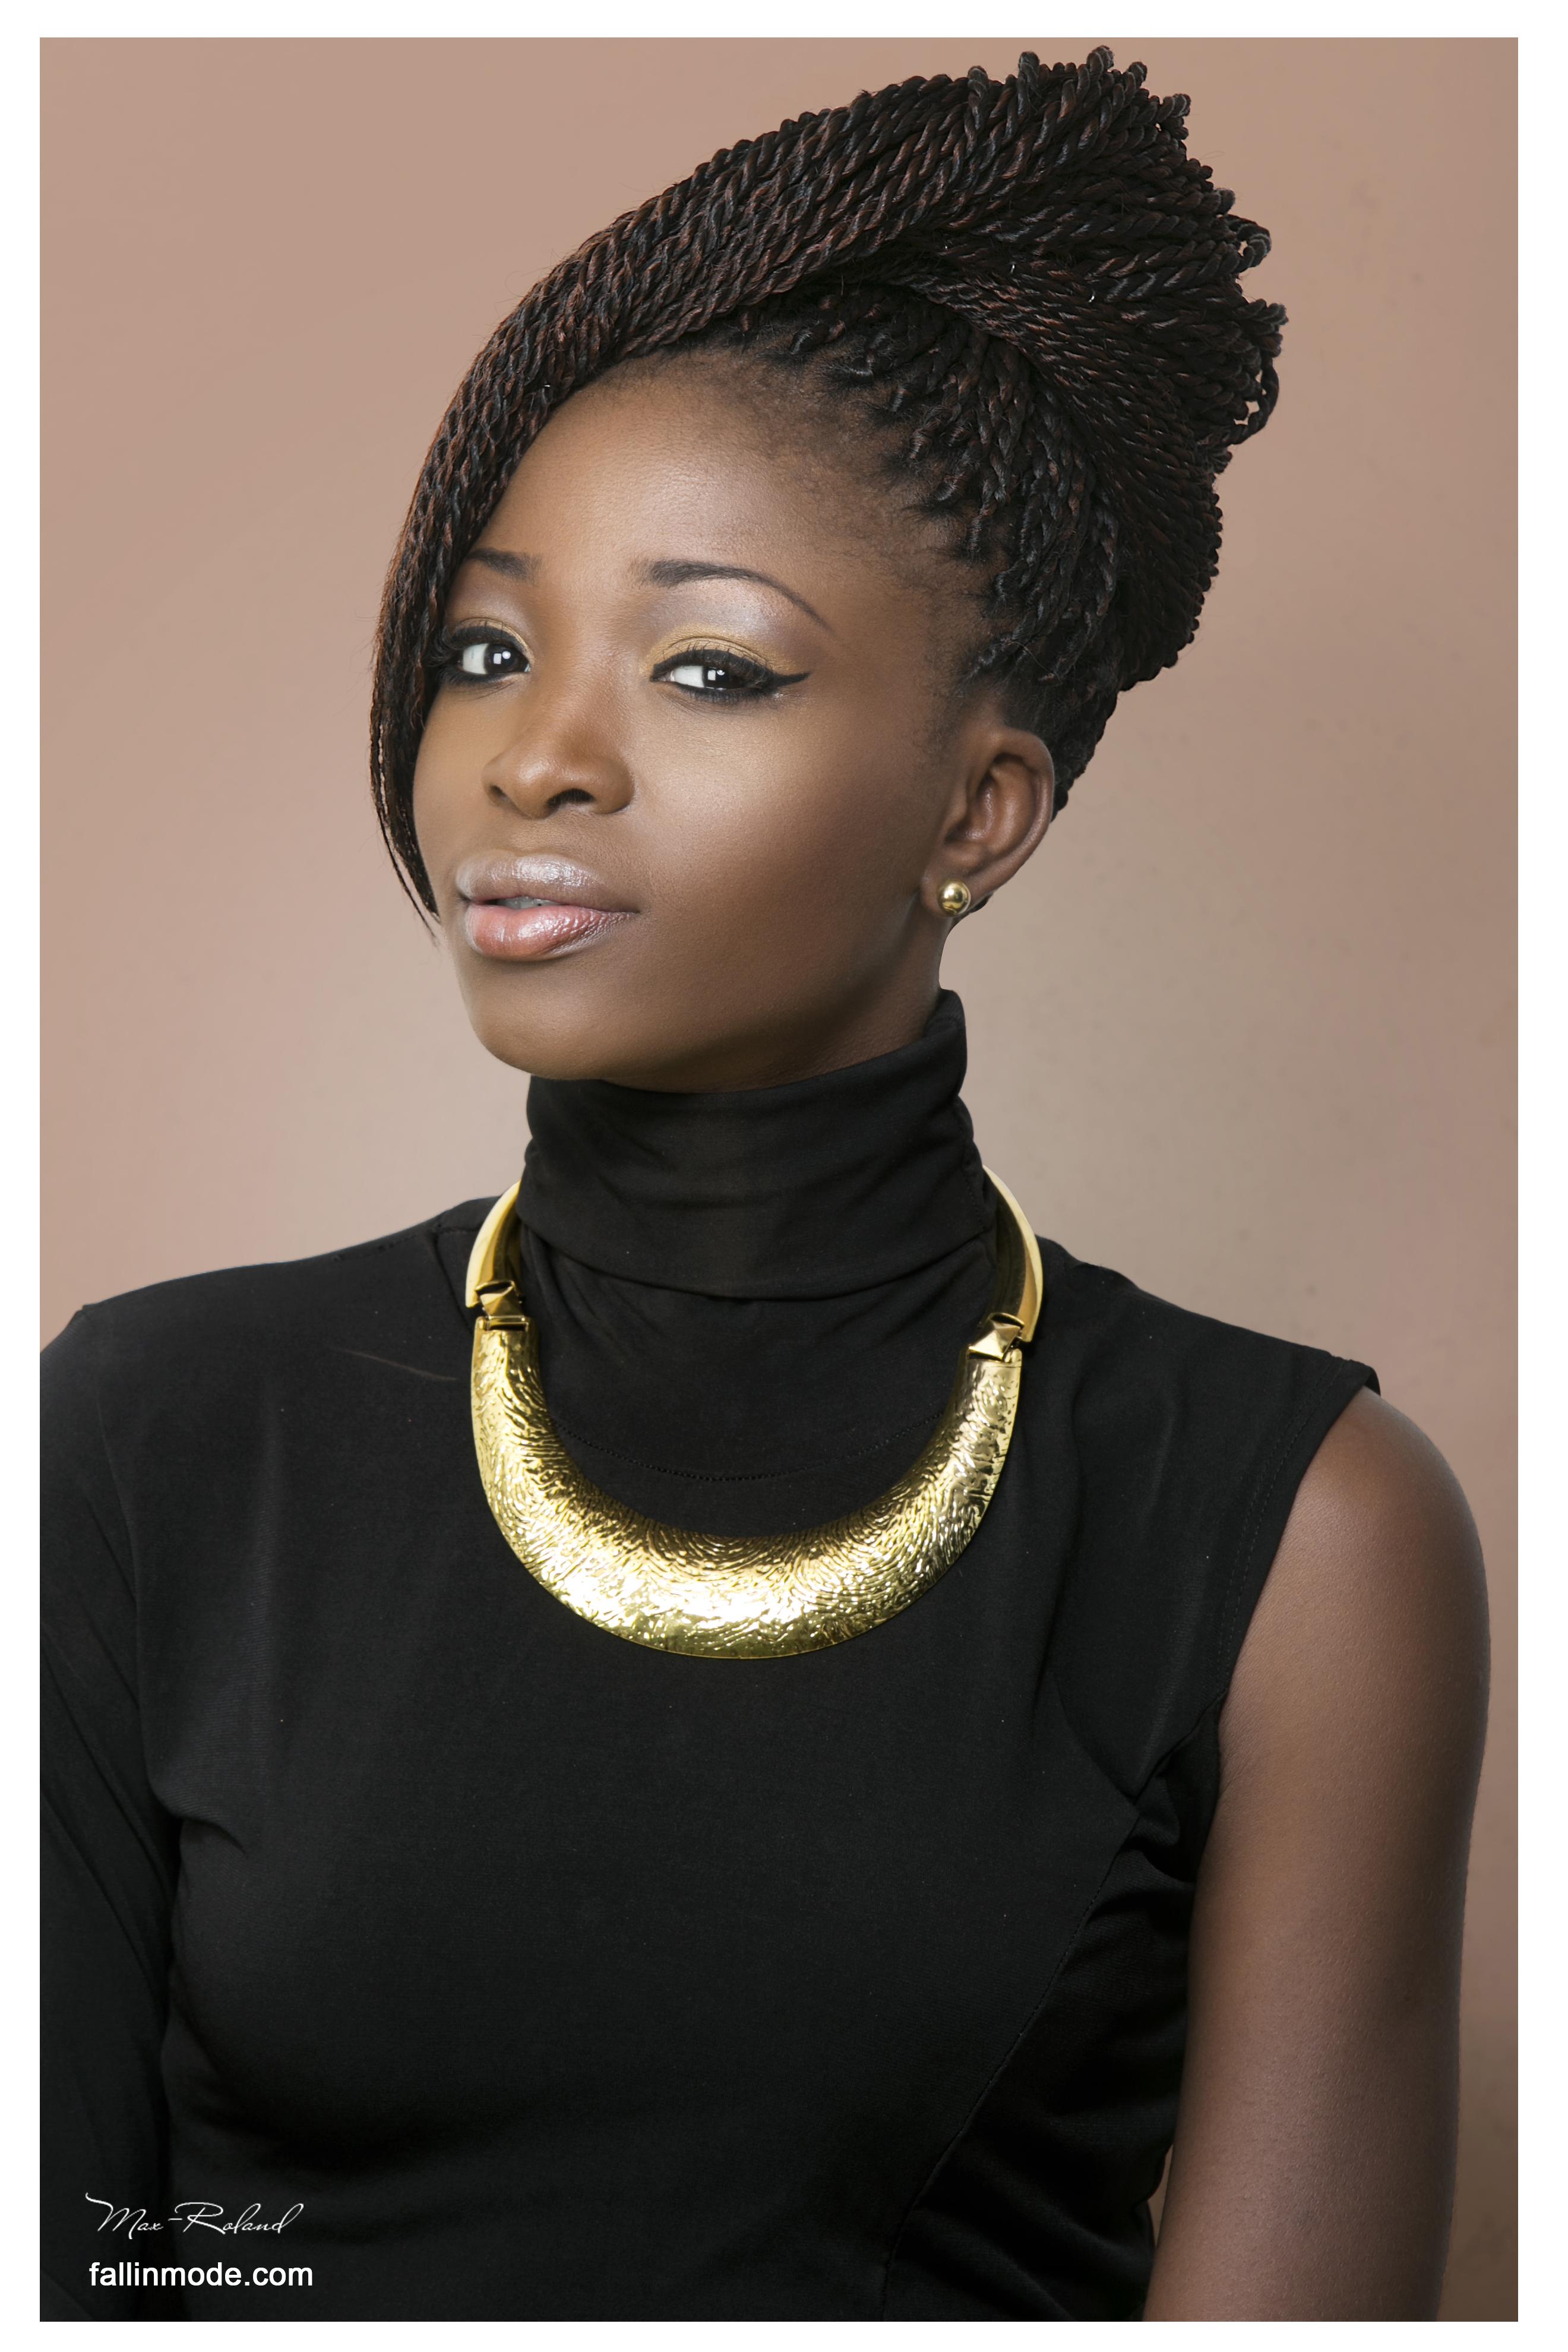 Sénato_Dieudonné_Coiffure_Hairstyle_Afrikfashion_mode_ivoirienne_Makissa_Camara